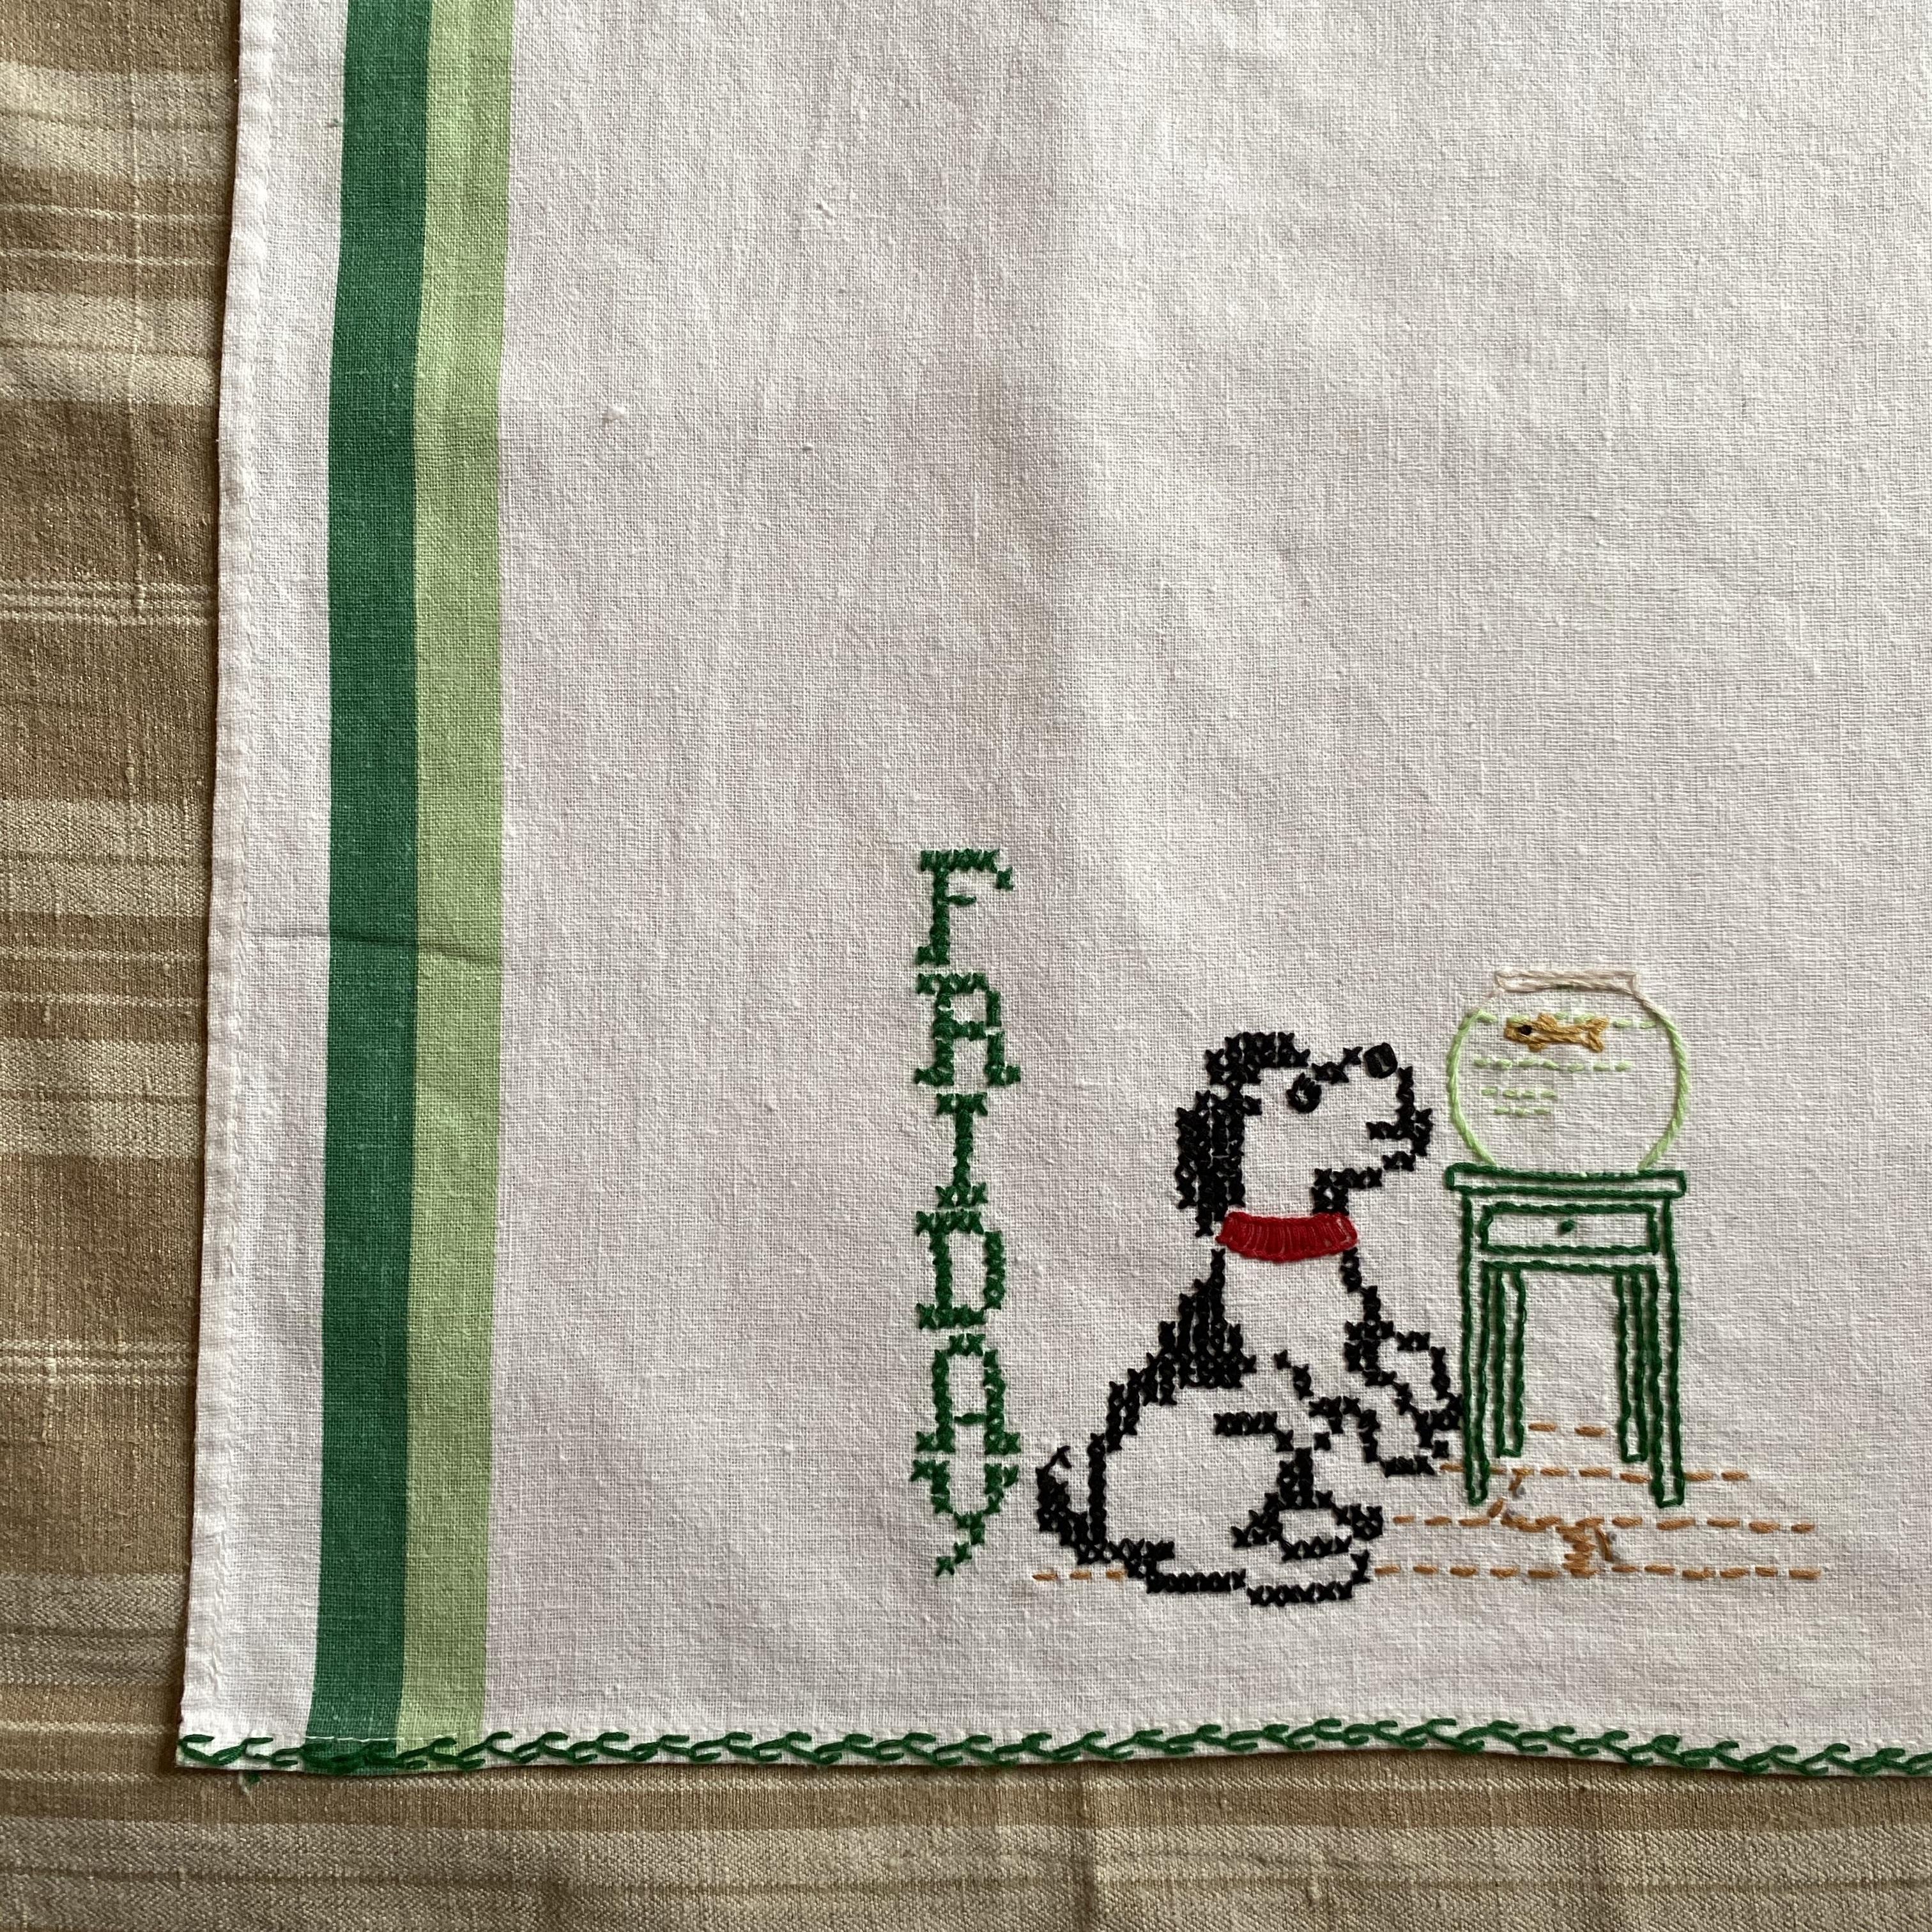 France ヴィンテージ手刺繍トーション・いぬと金魚 / uv0107